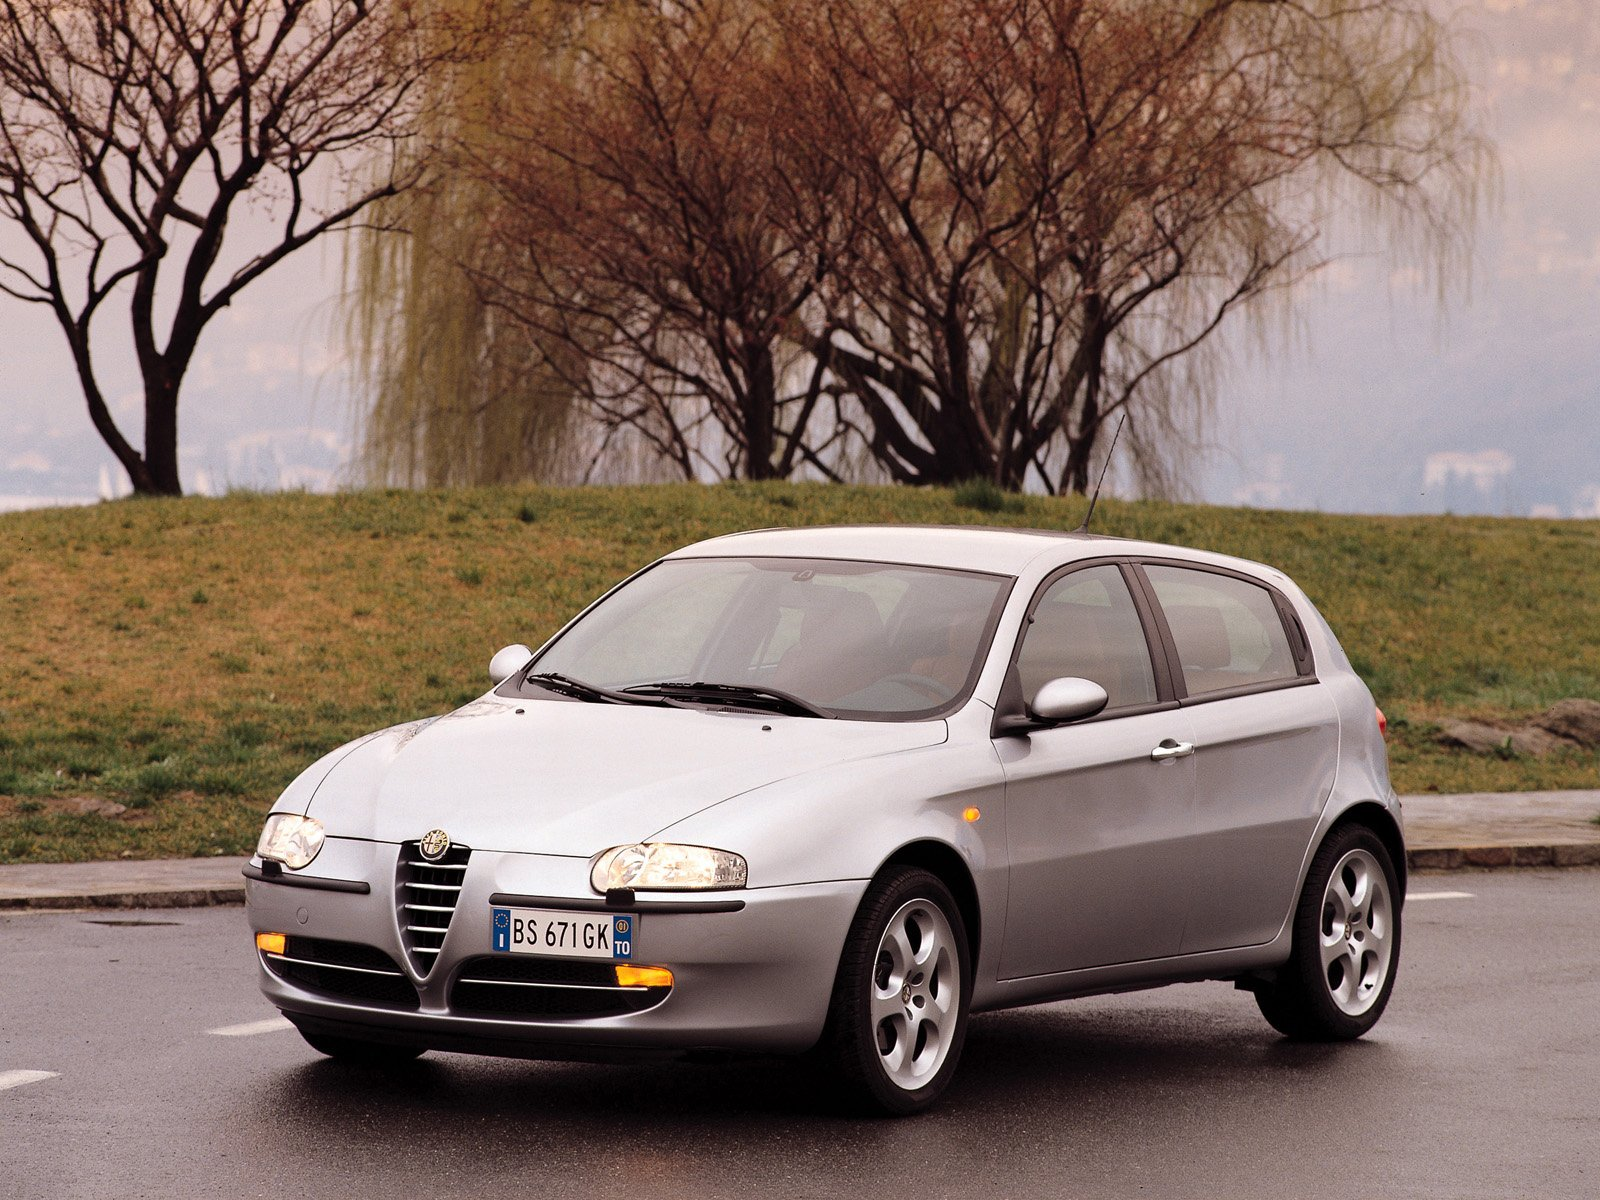 sports car alfa romeo 147 2002. Black Bedroom Furniture Sets. Home Design Ideas